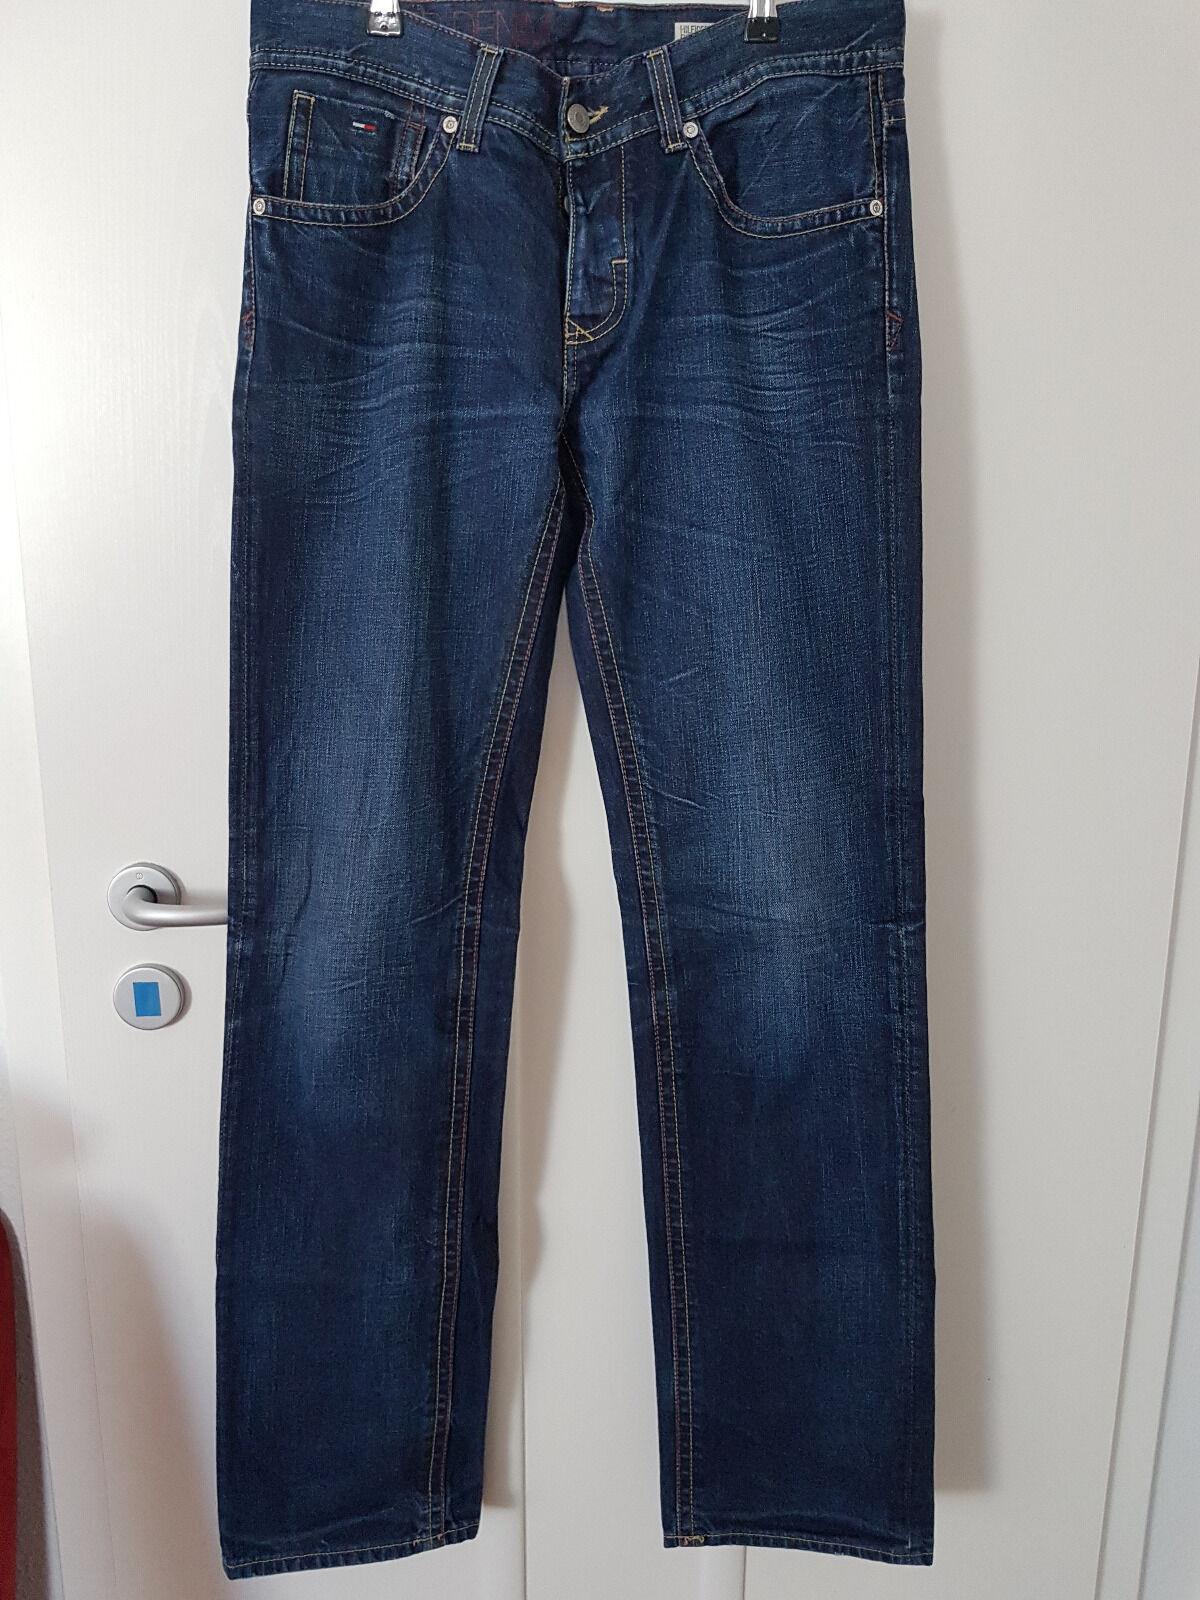 Jeanshose Jeanshose Jeanshose Größe 32 36 Blau  WILSON REGULAR  HILFIGER DENIM dd6c9d